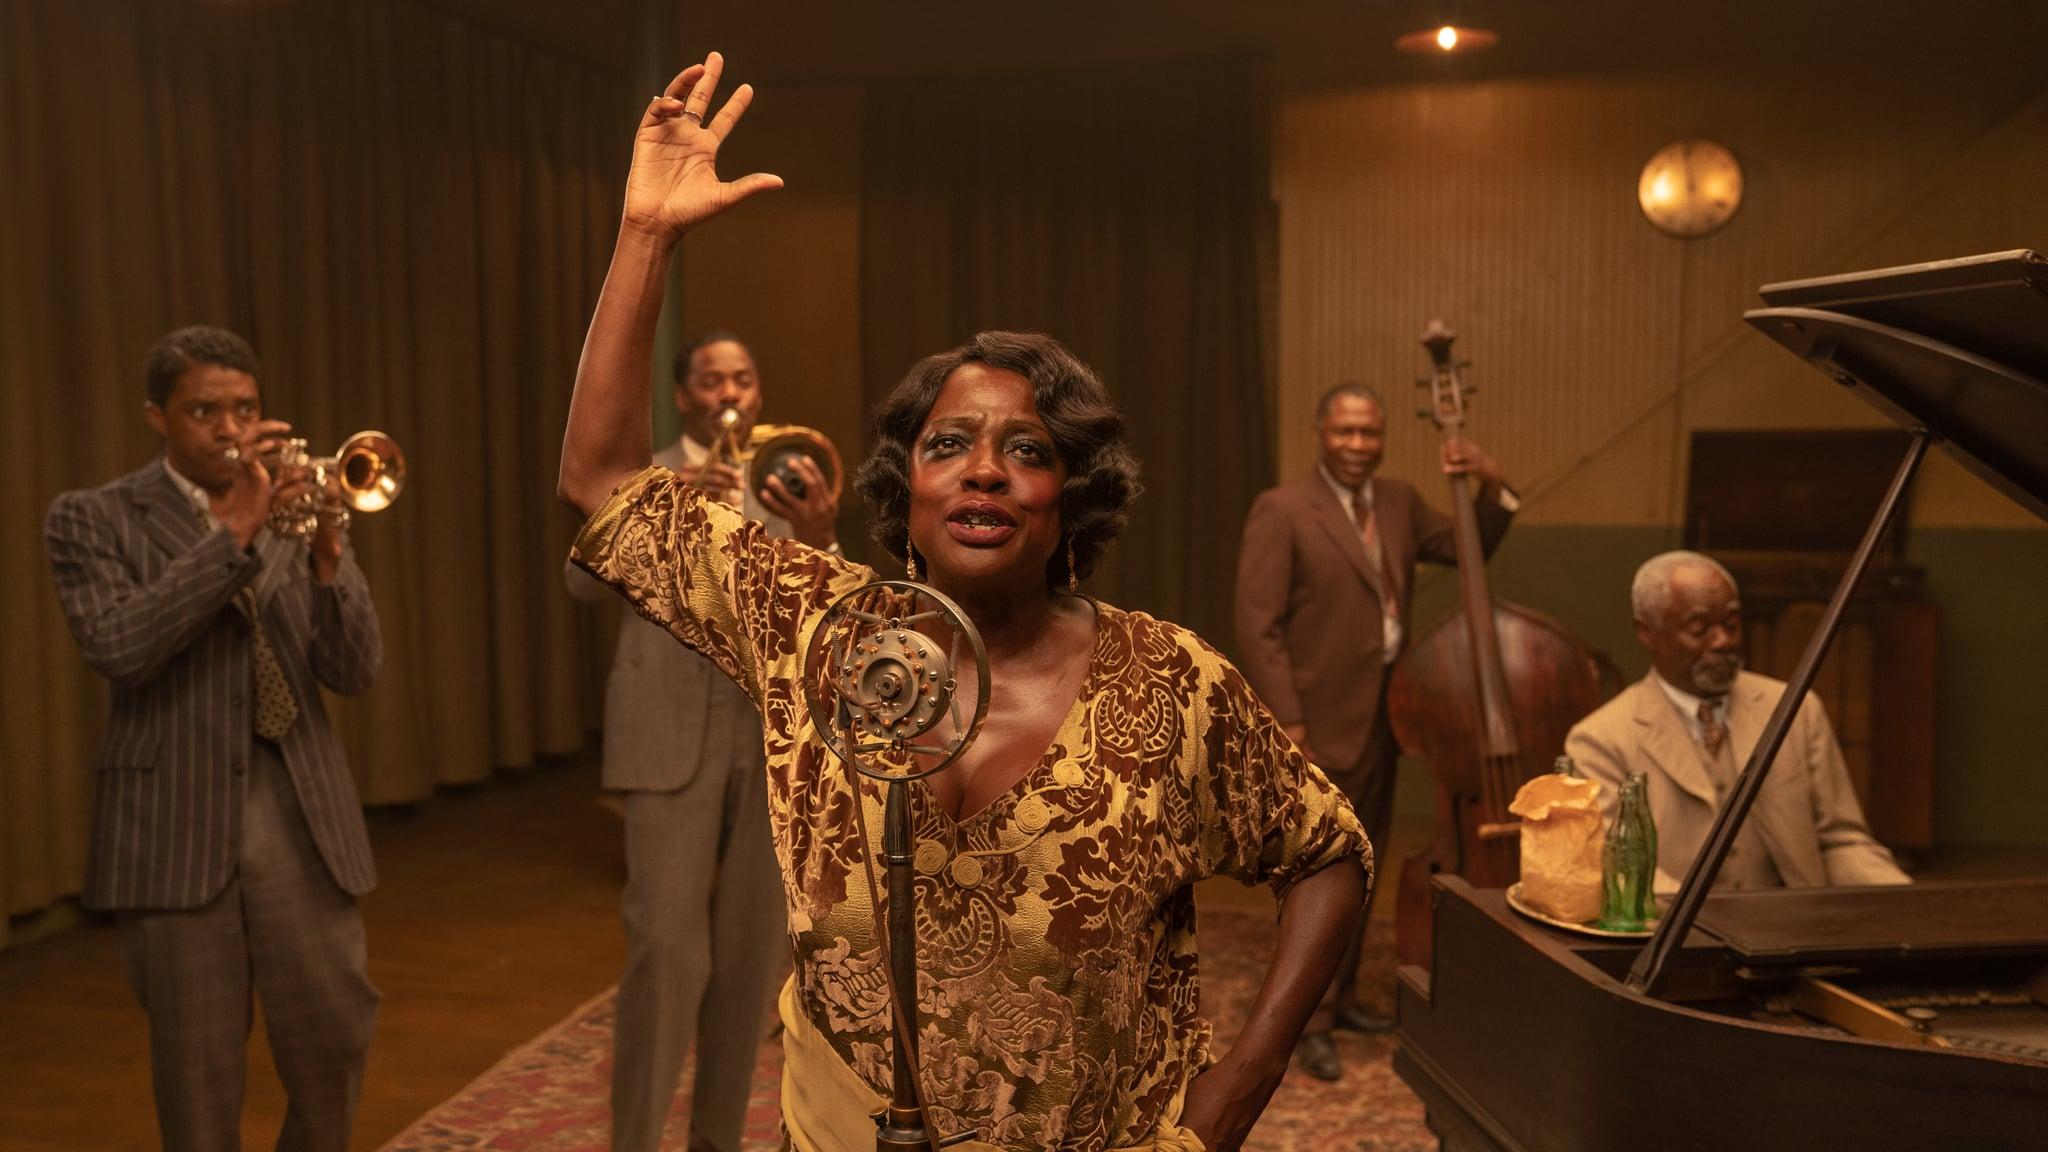 MA RAINEY'S BLACK BOTTOM(2020)Chadwick Boseman as Levee, Colman Domingo as Cutler, Viola Davis as Ma Rainey, Michael Potts as Slow Drag and Glynn Turman as Toledo.   Cr. David Lee/NETFLIX